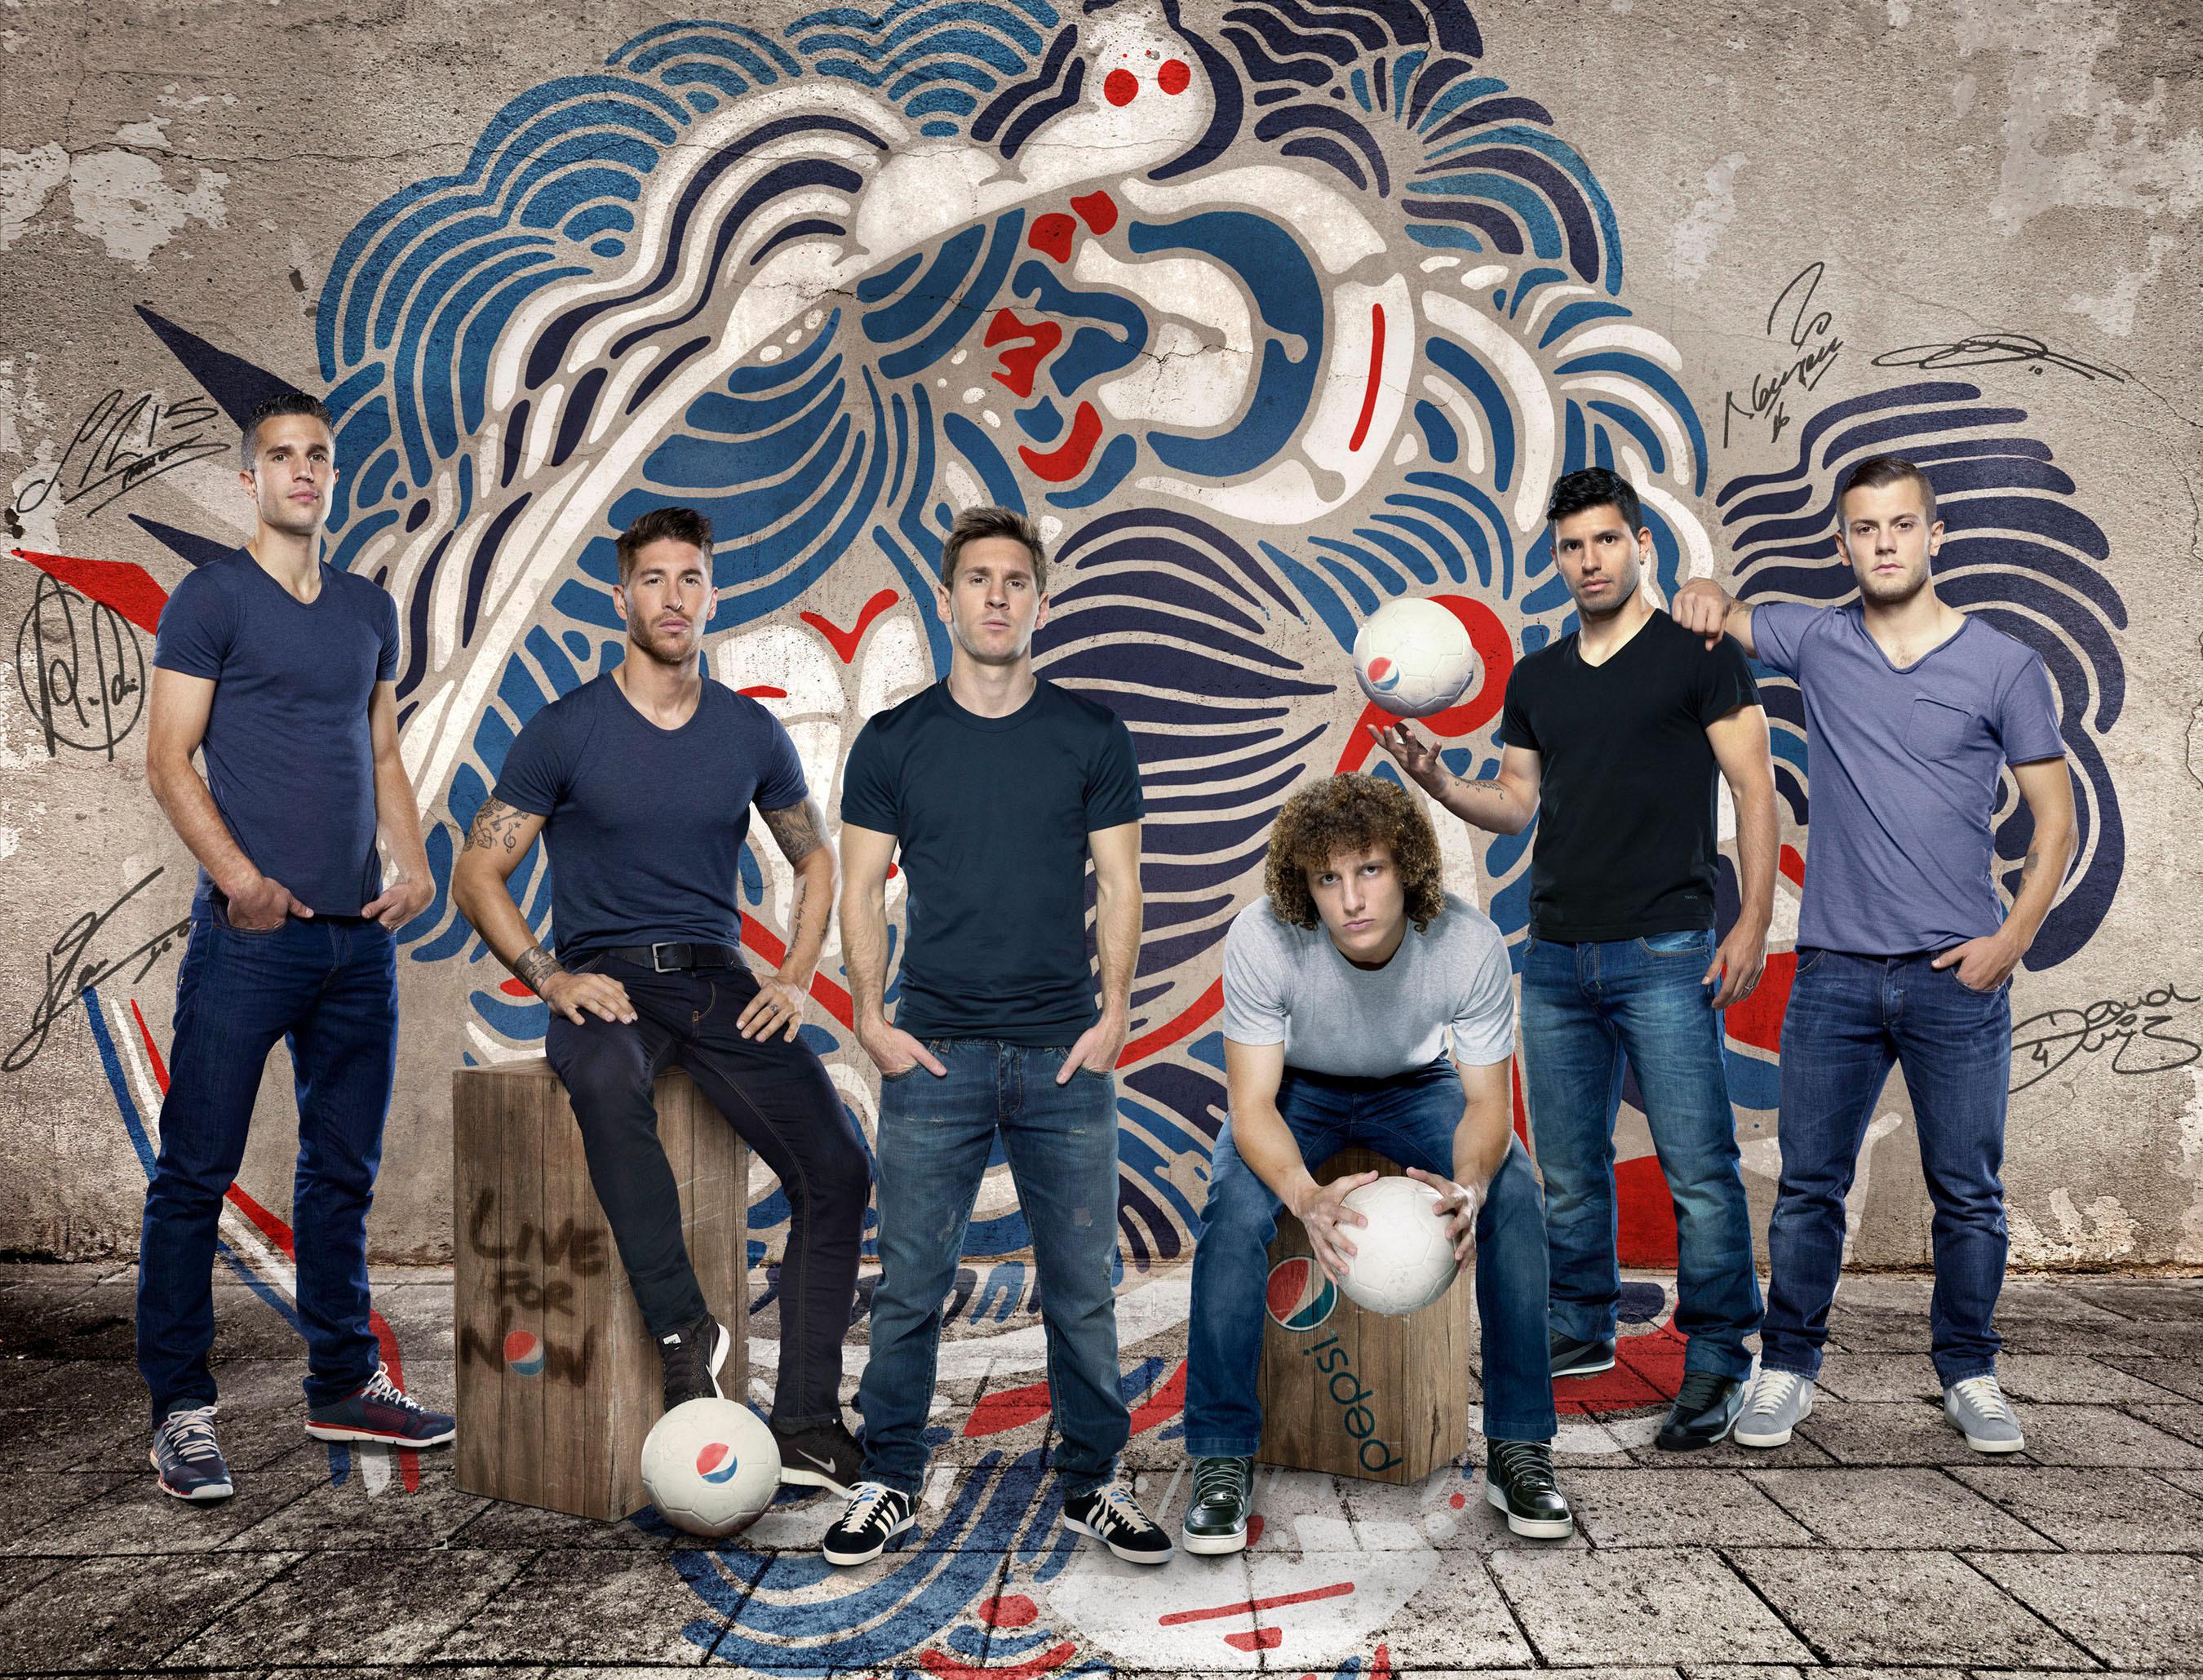 "Pepsi ""NOW IS WHAT YOU MAKE IT"" Commercial Feat Lionel Messi, Robin van Persie, David Luiz, Sergio Ramos, Sergio Agüero, and Jack Wilsher"